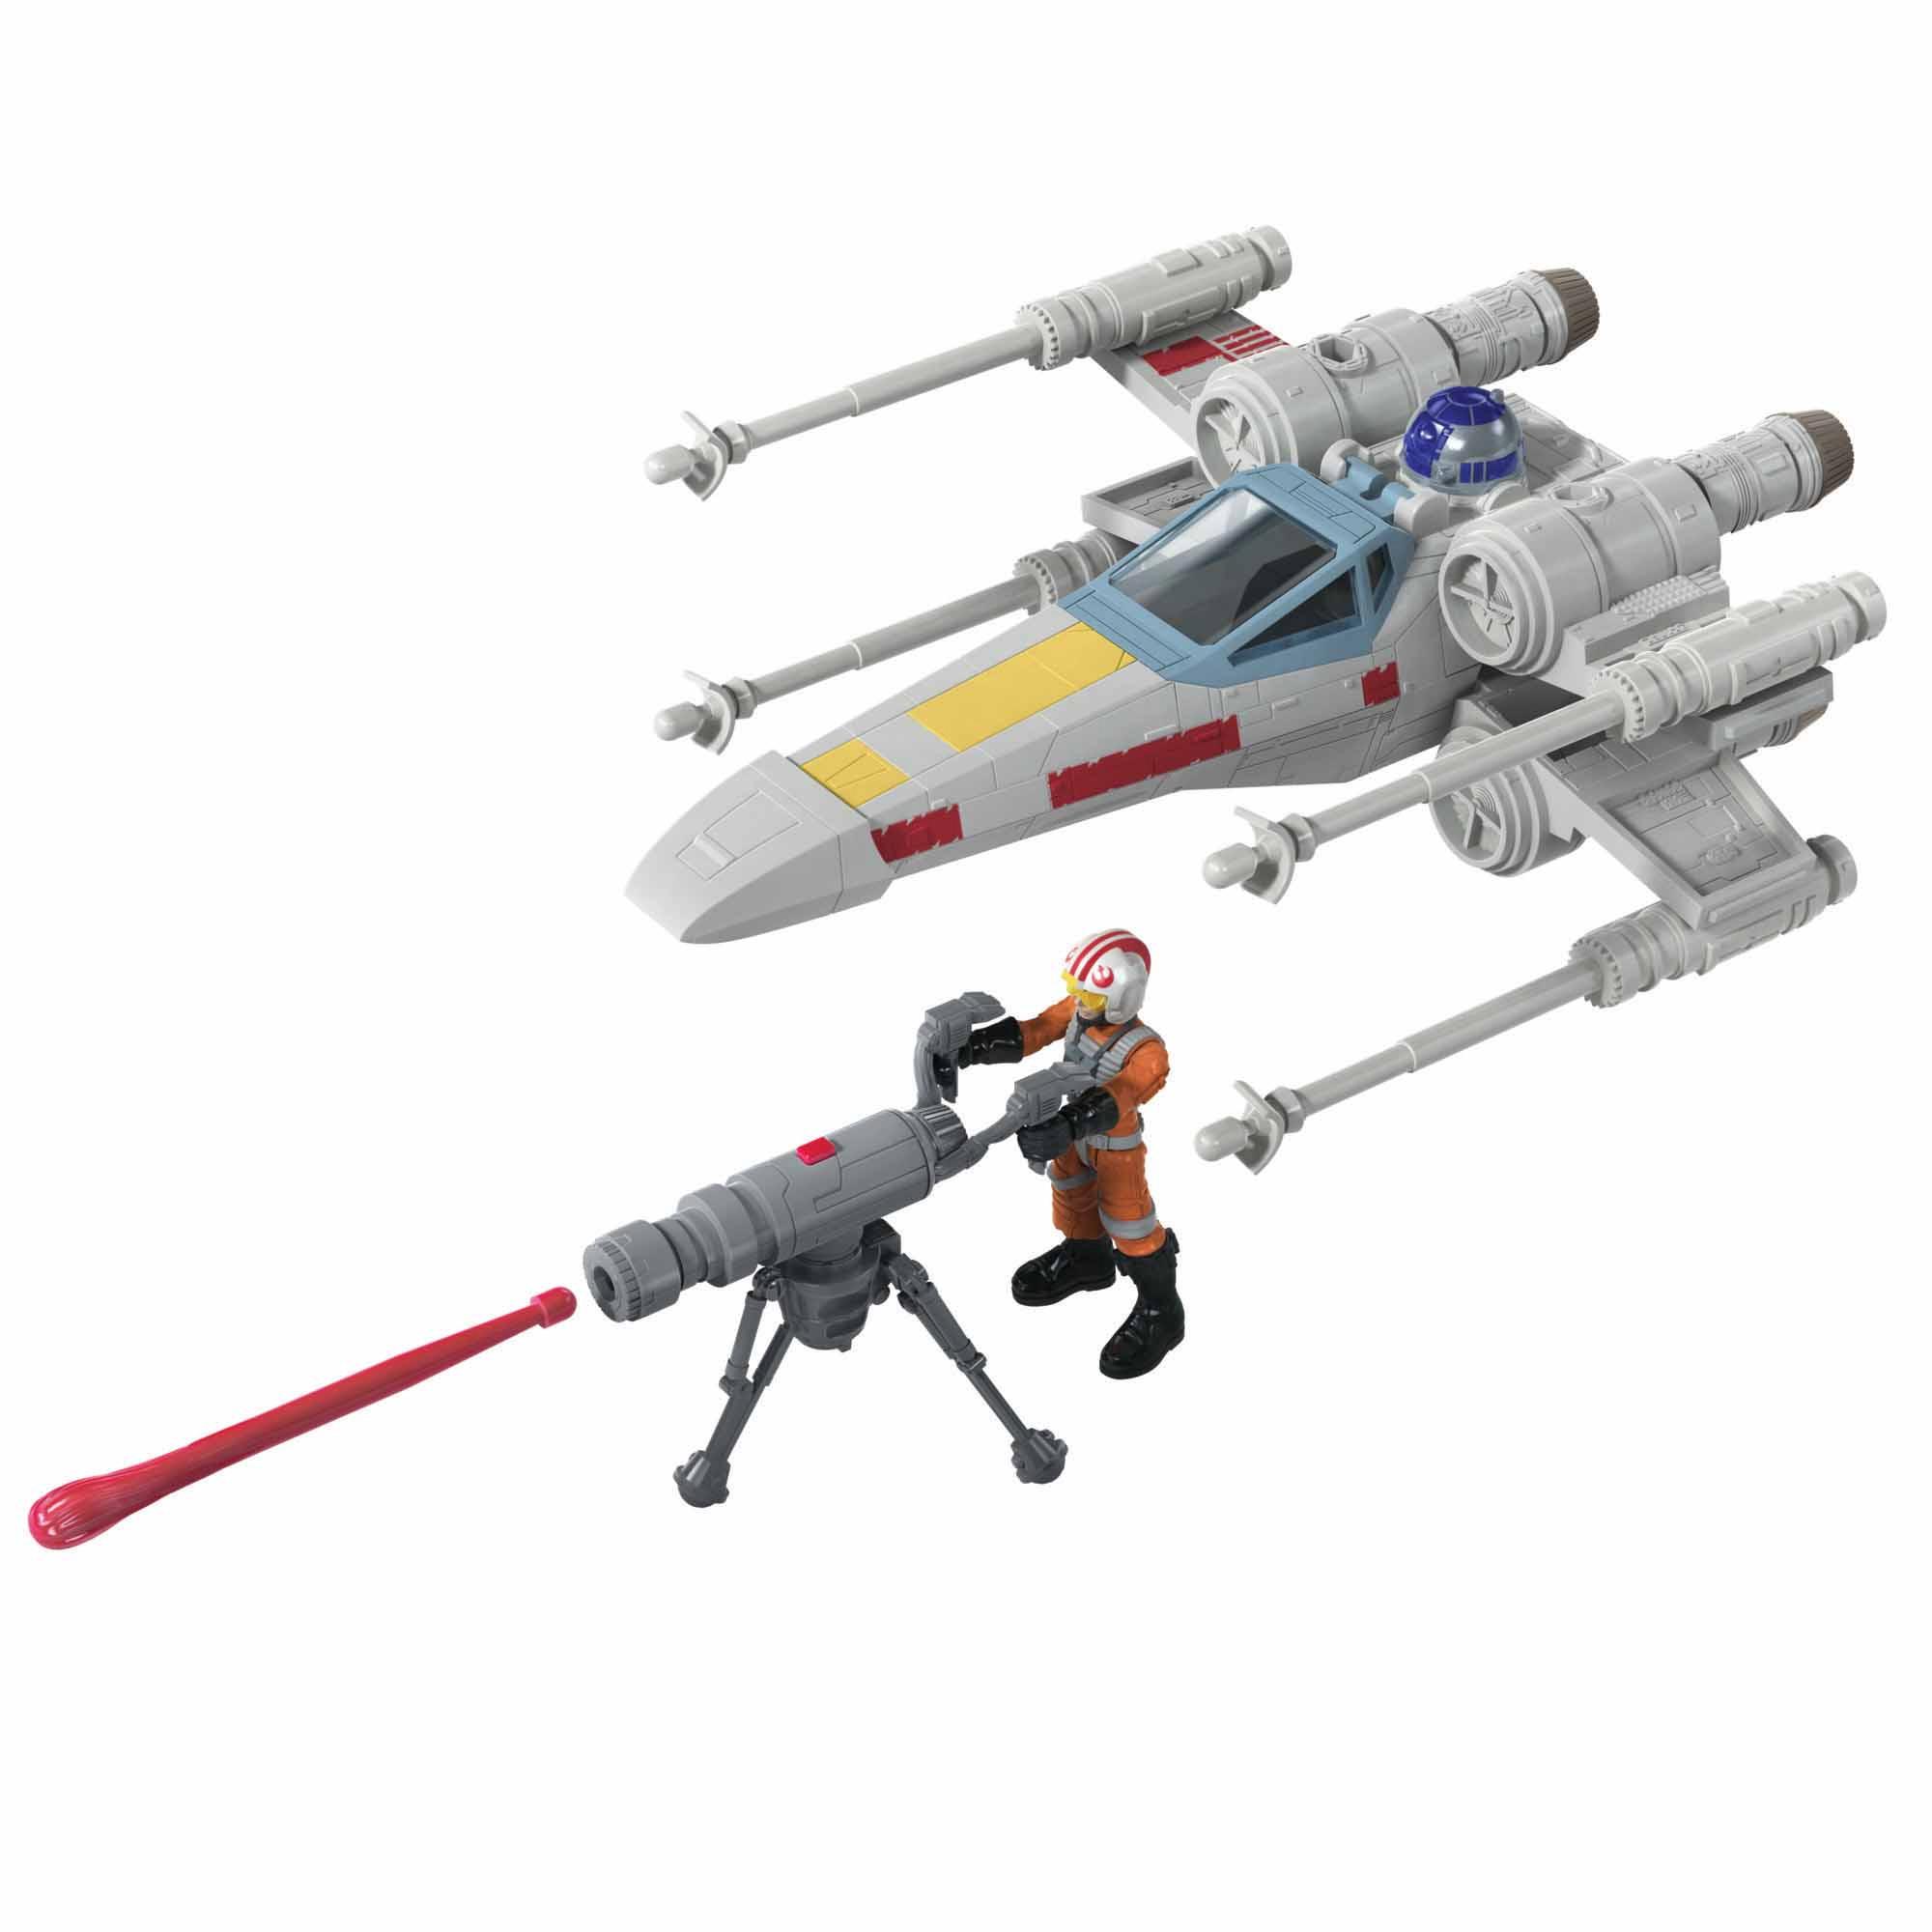 Star Wars Mission Fleet Luke Skywalker X-wing-gevechtsvliegtuig